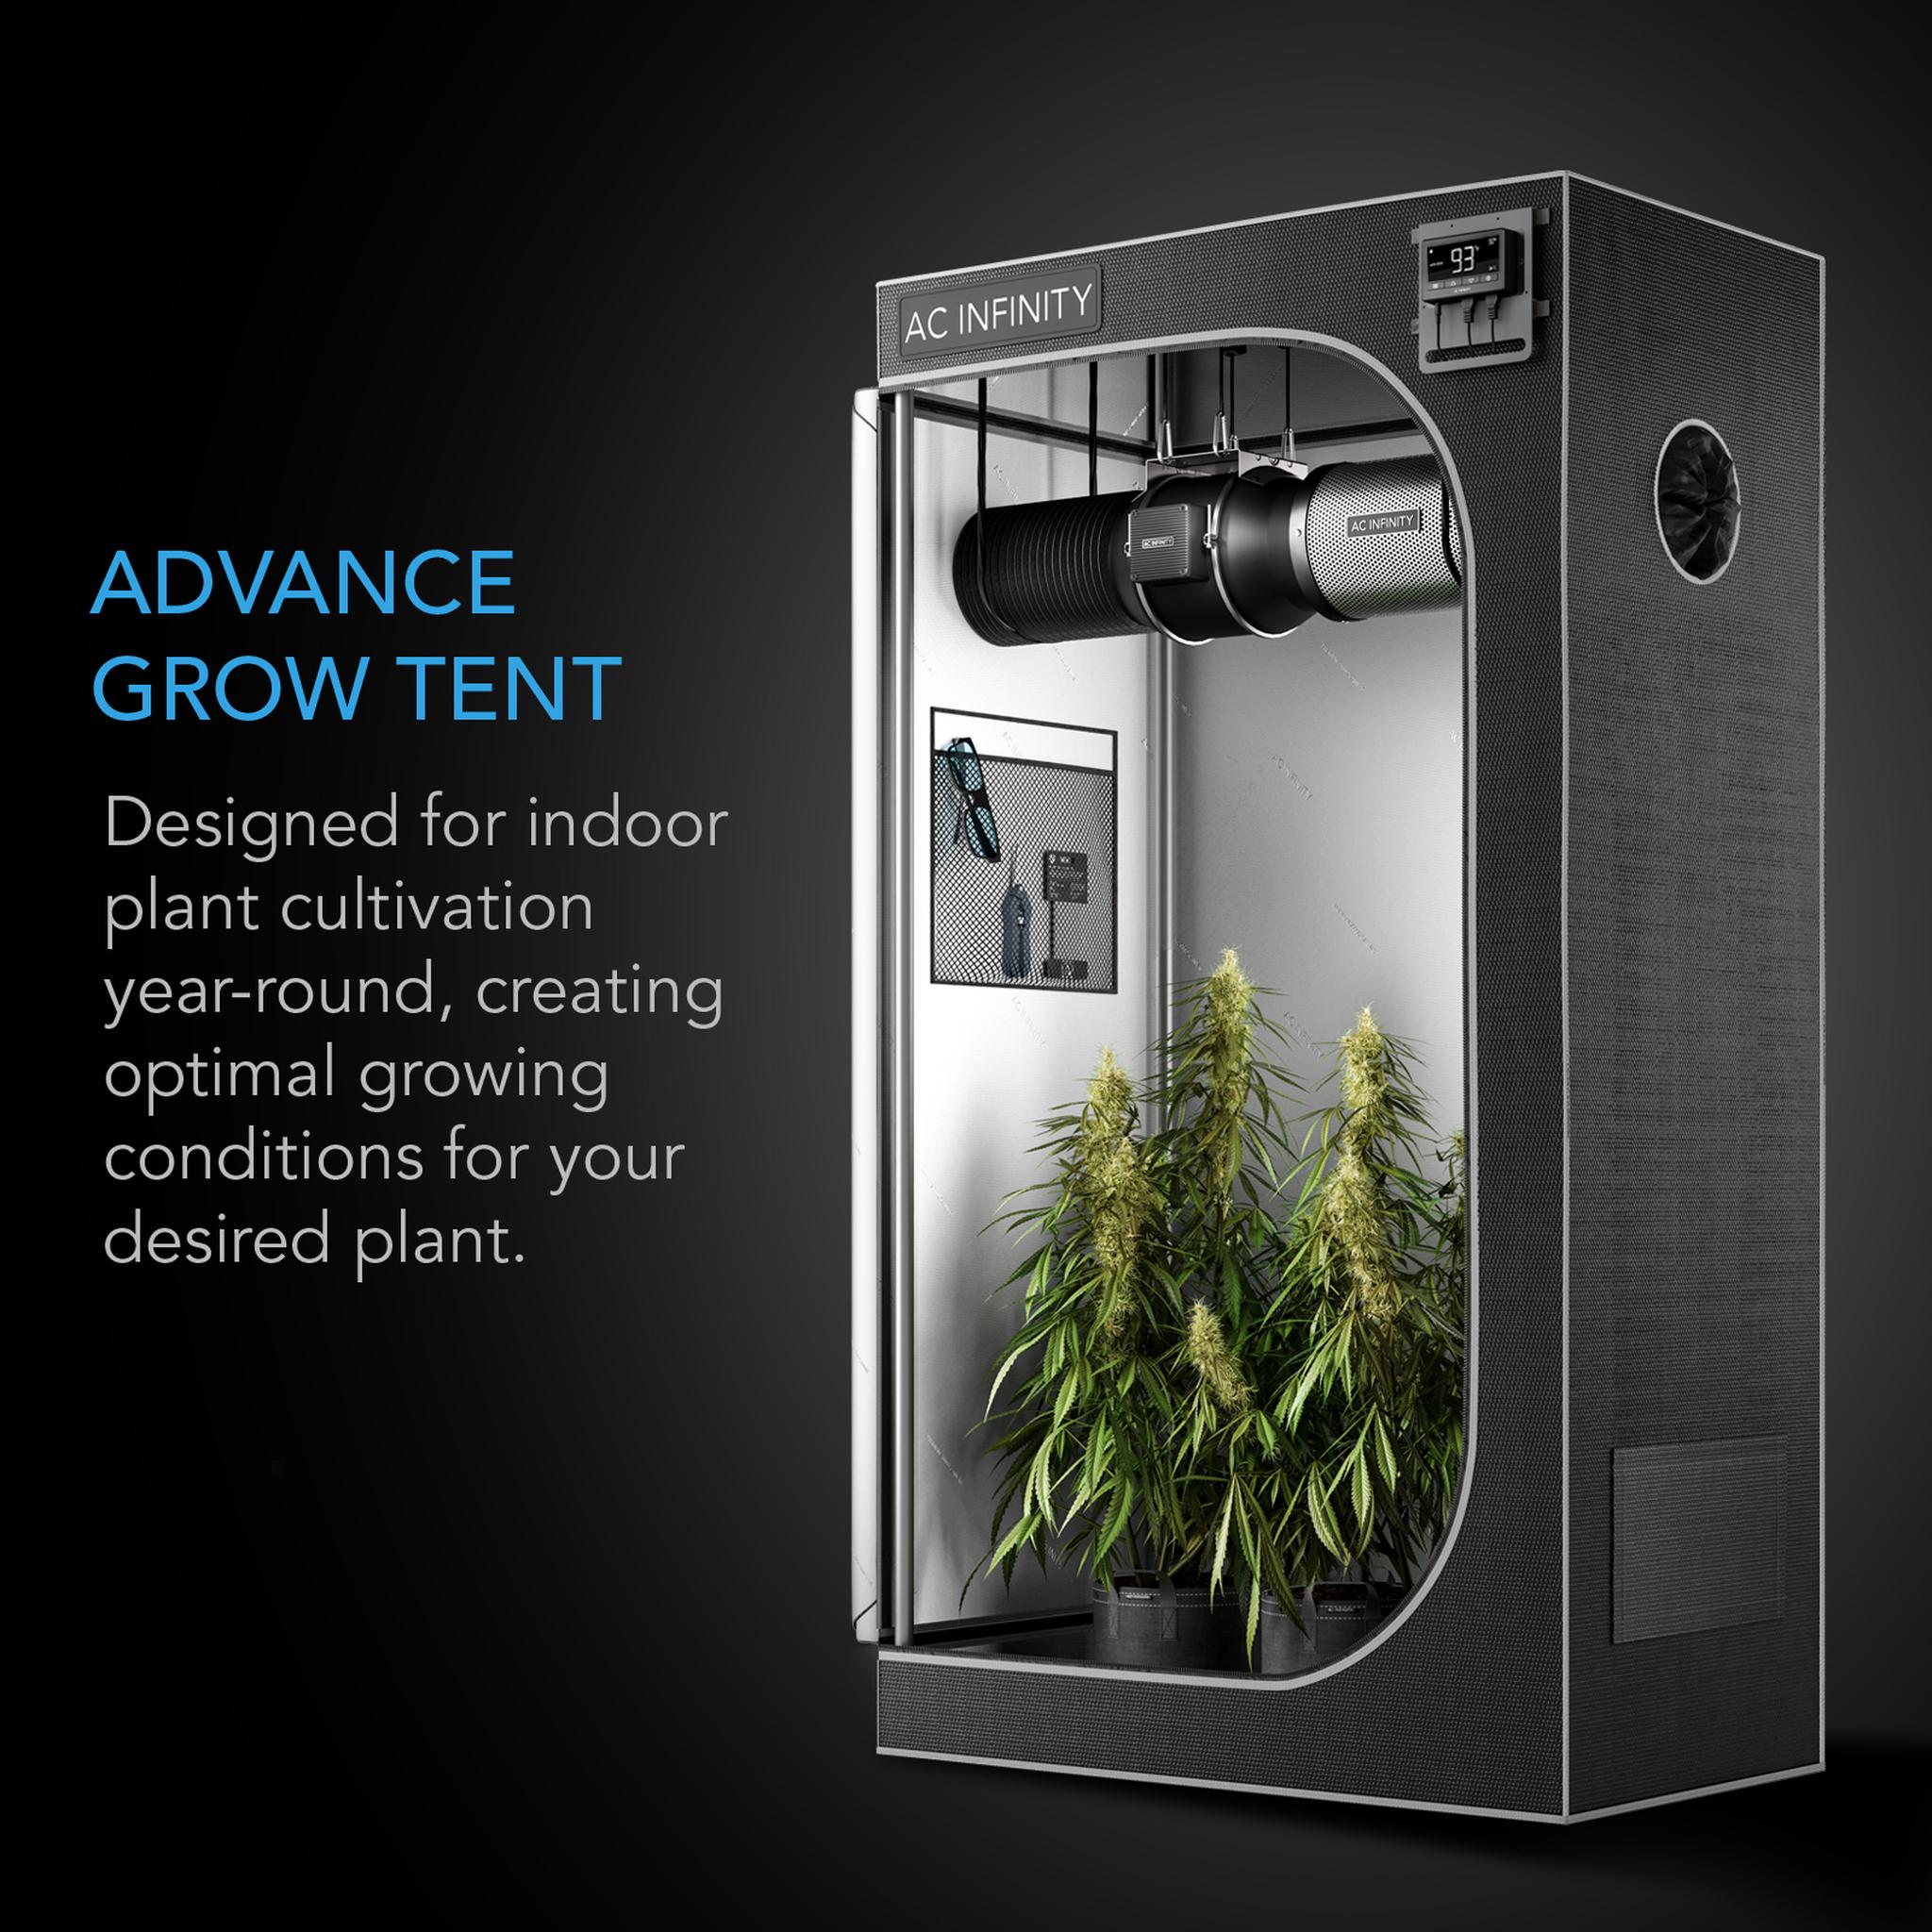 Advance Grow Tent CloudLab Series